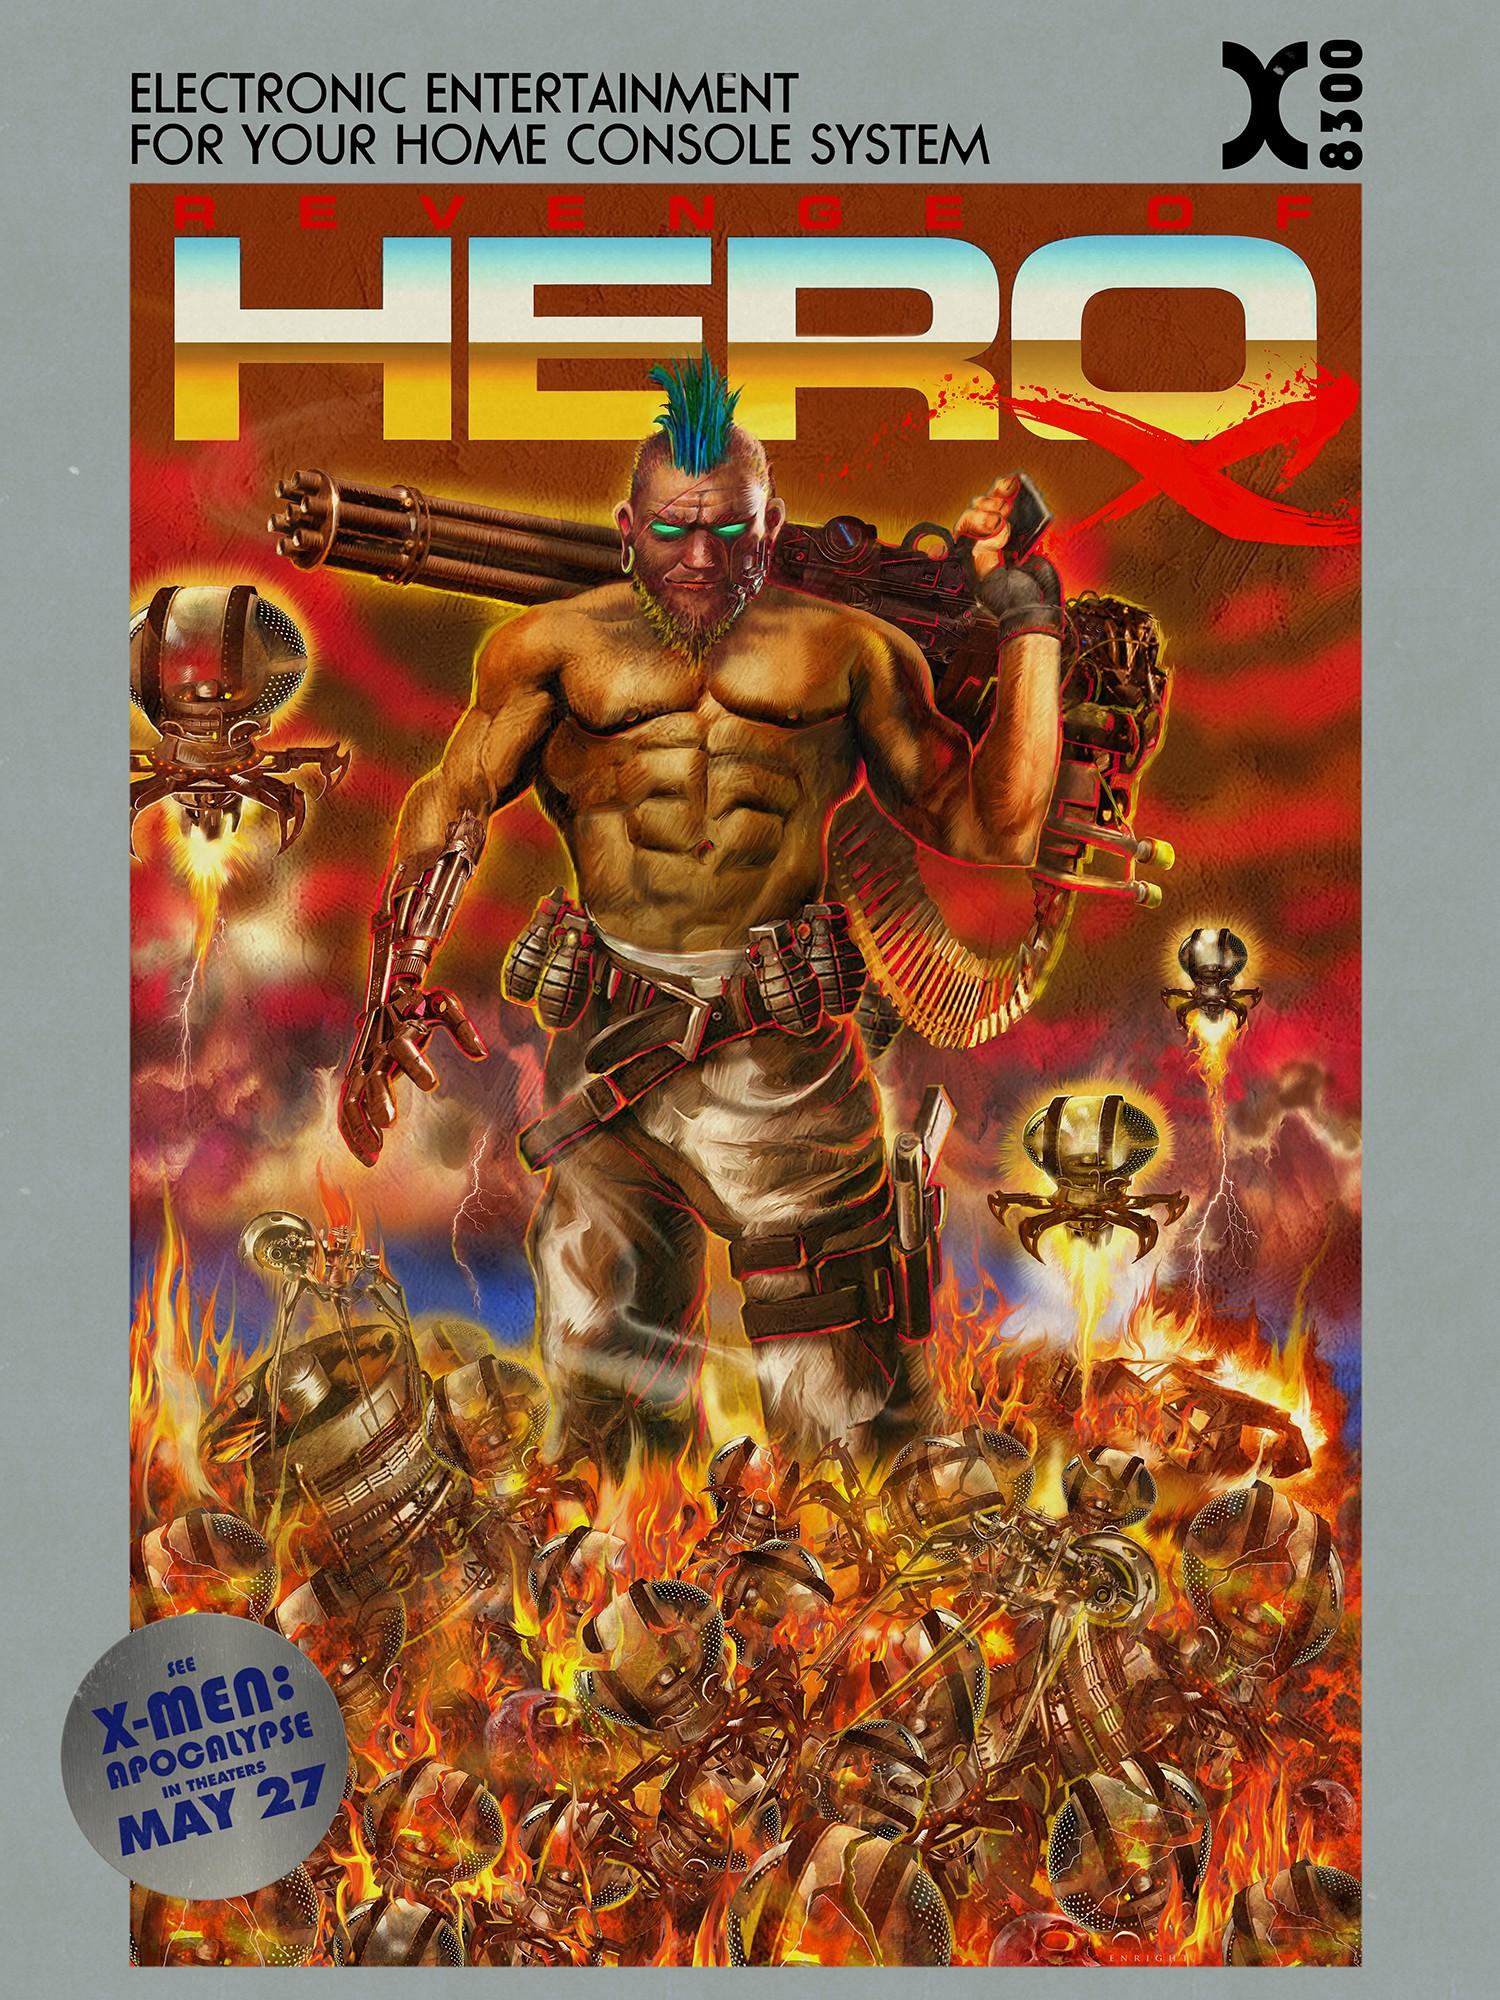 X-Men: Apocalisse: il poster del videogame Revenge of Hero X